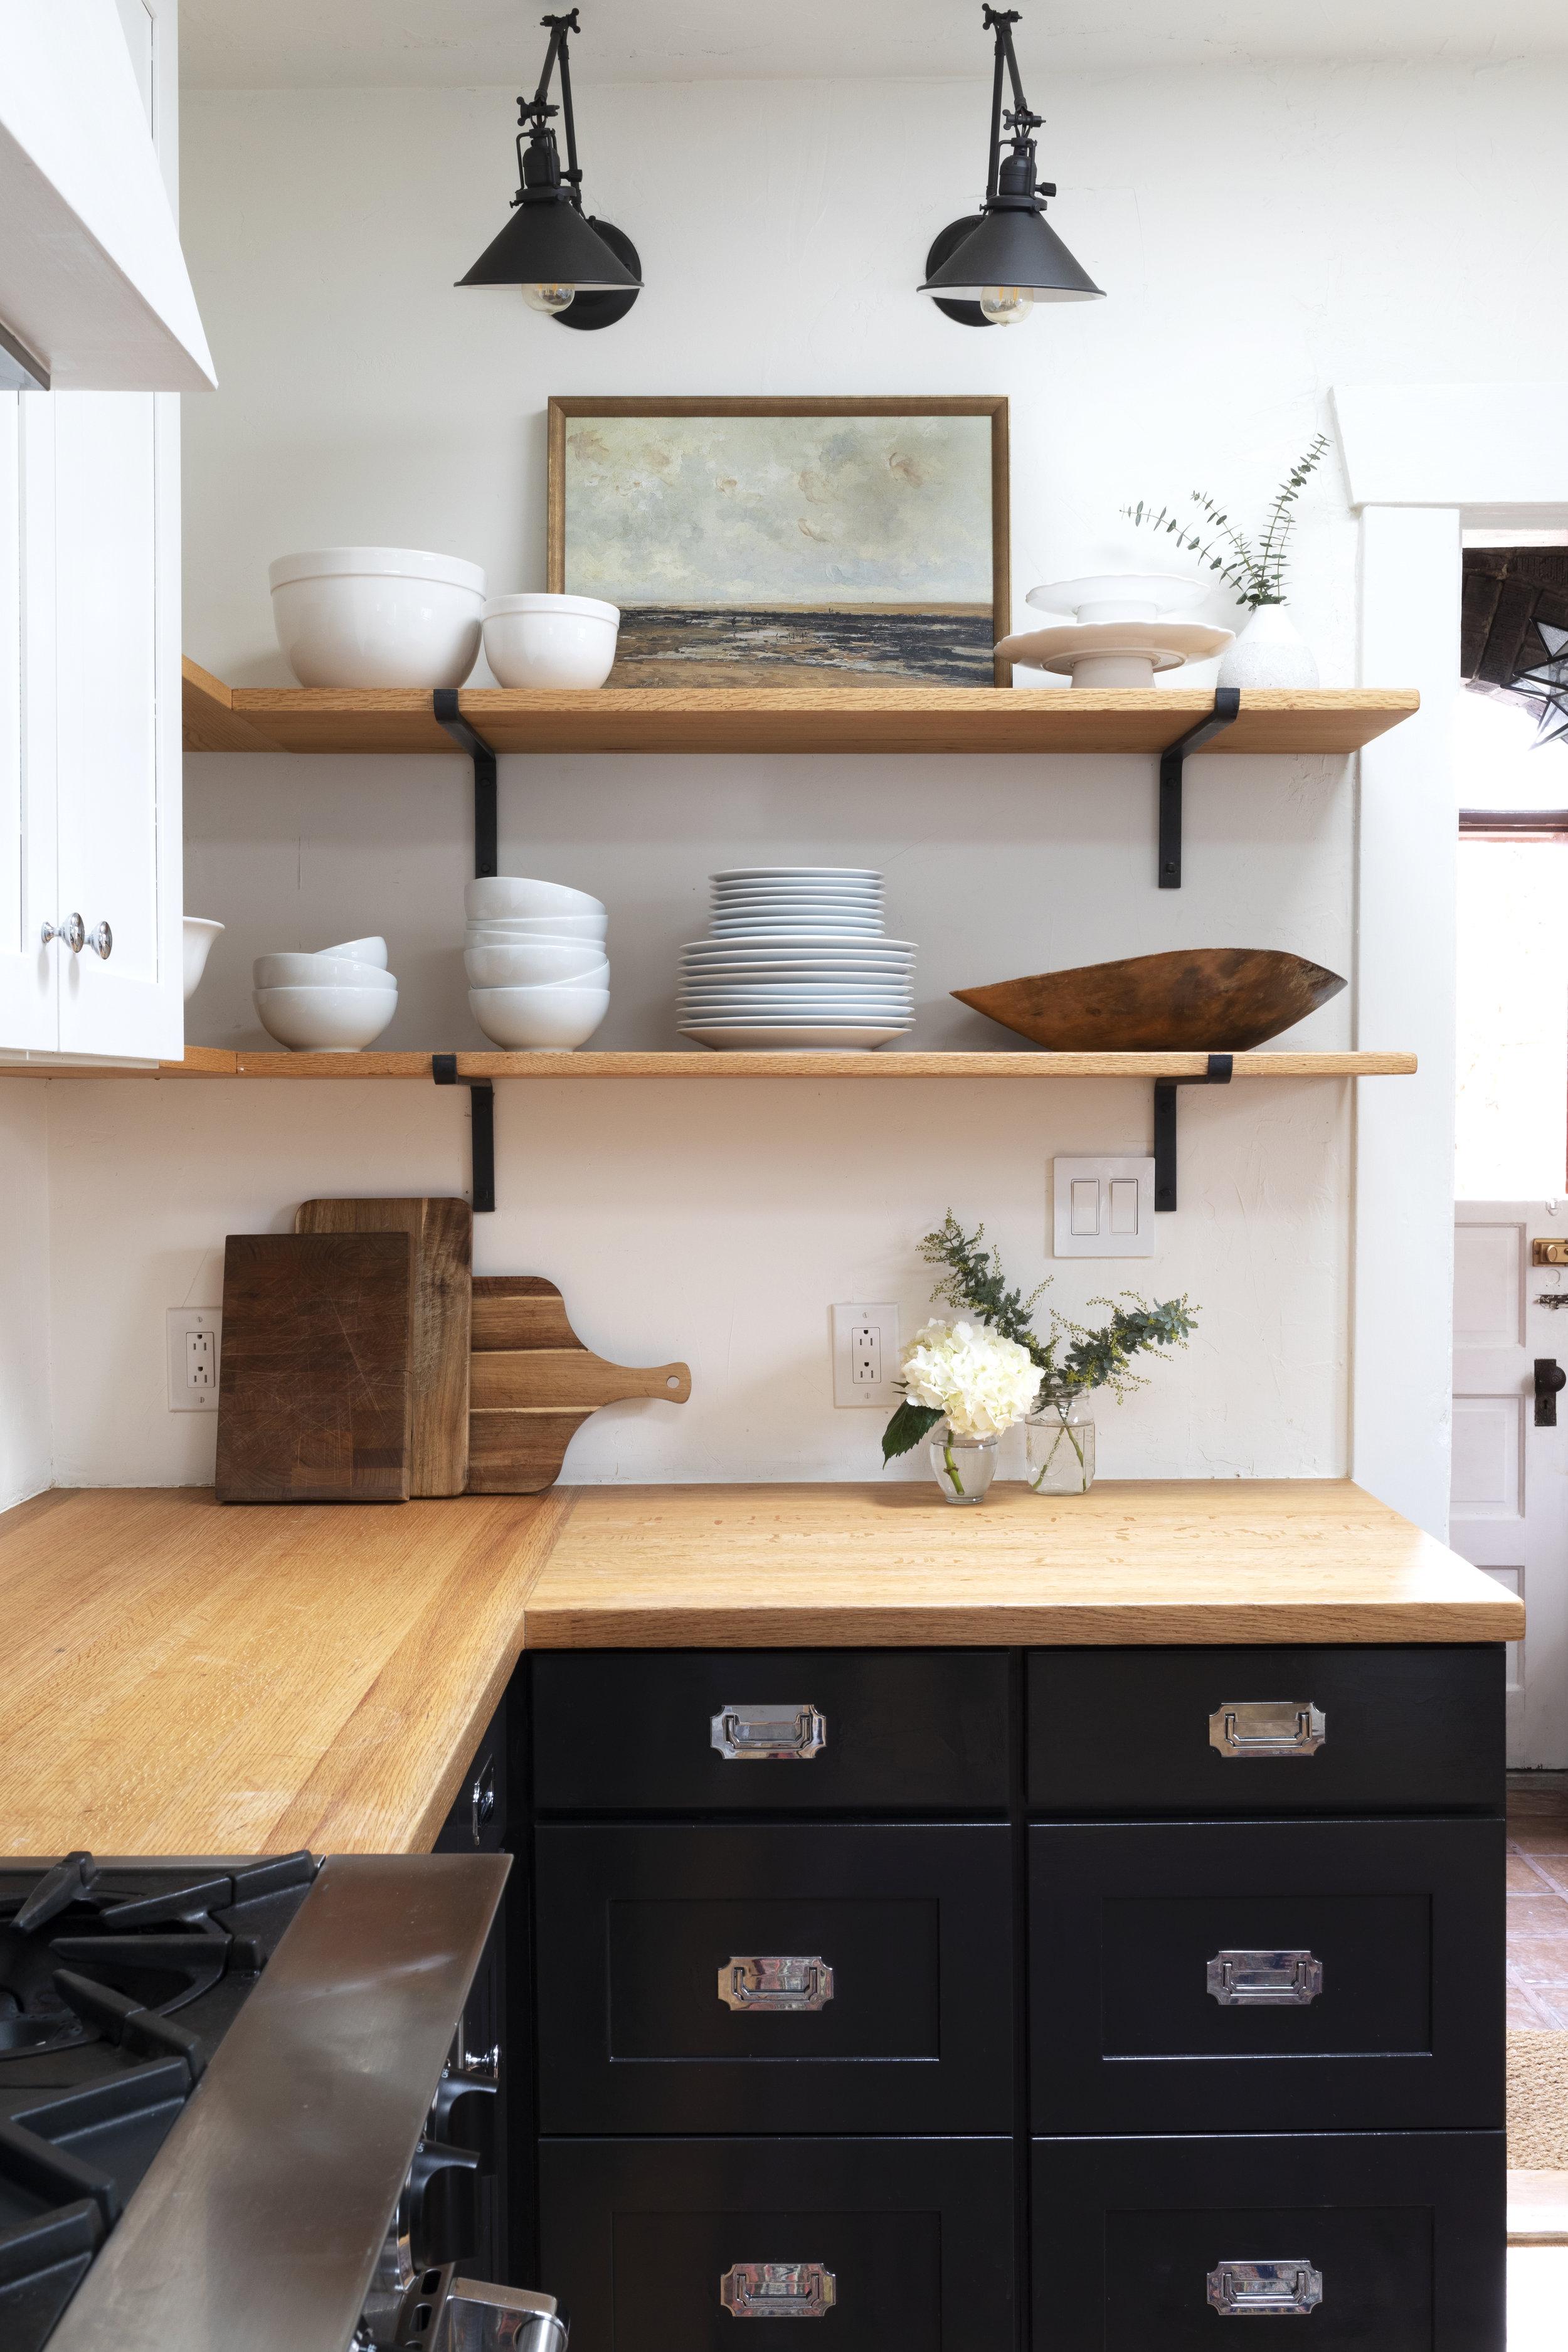 Red Oak Shelves, Counters, Floors